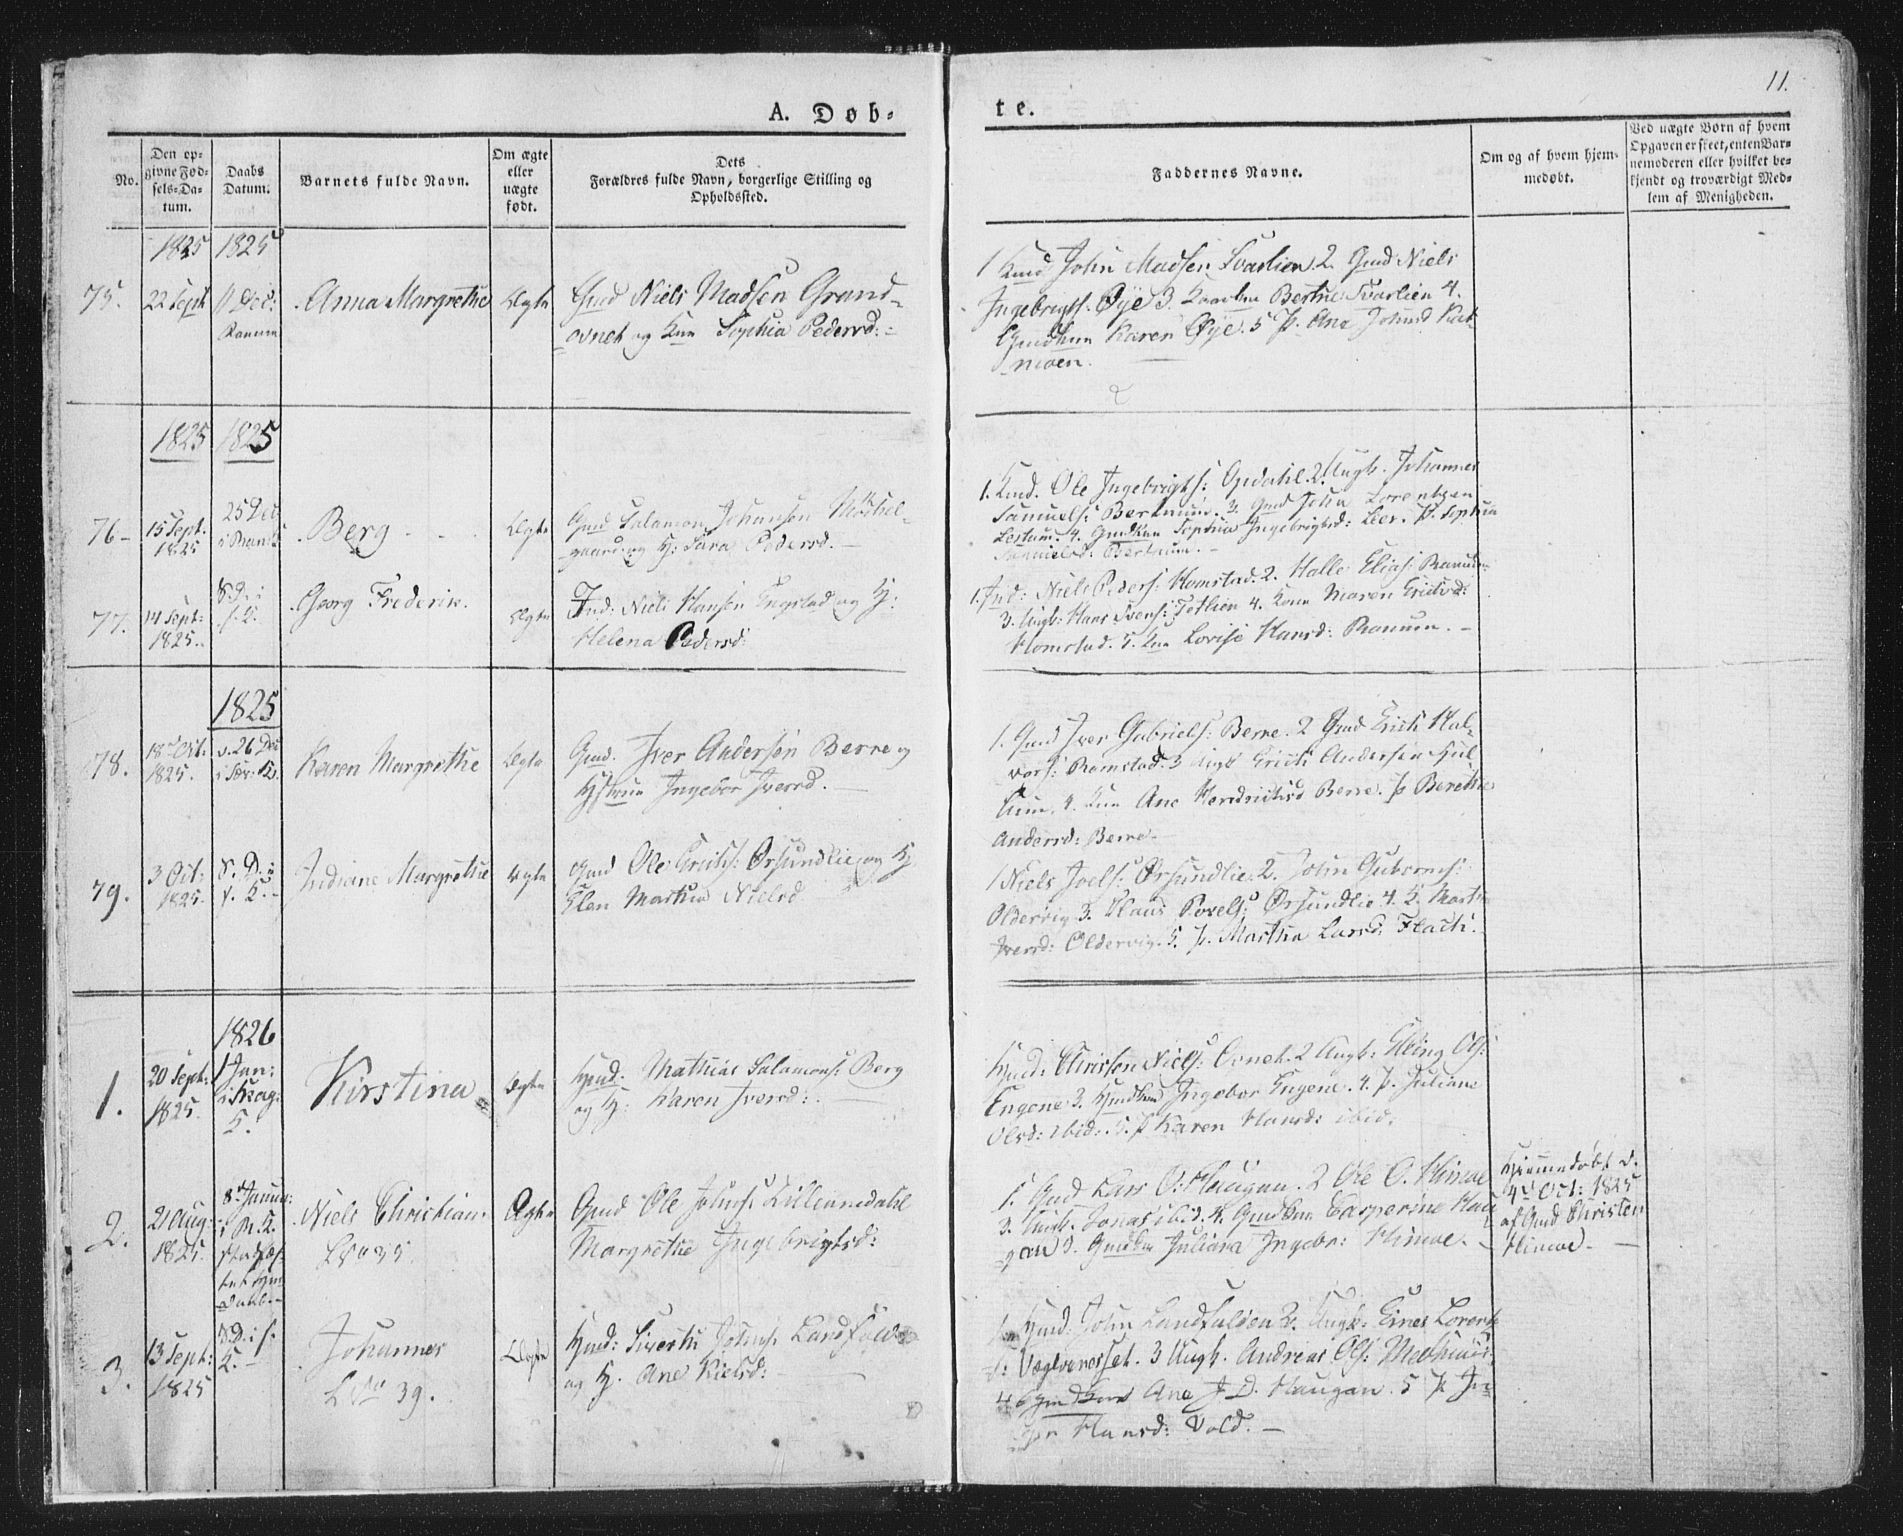 SAT, Ministerialprotokoller, klokkerbøker og fødselsregistre - Nord-Trøndelag, 764/L0551: Ministerialbok nr. 764A07a, 1824-1864, s. 11